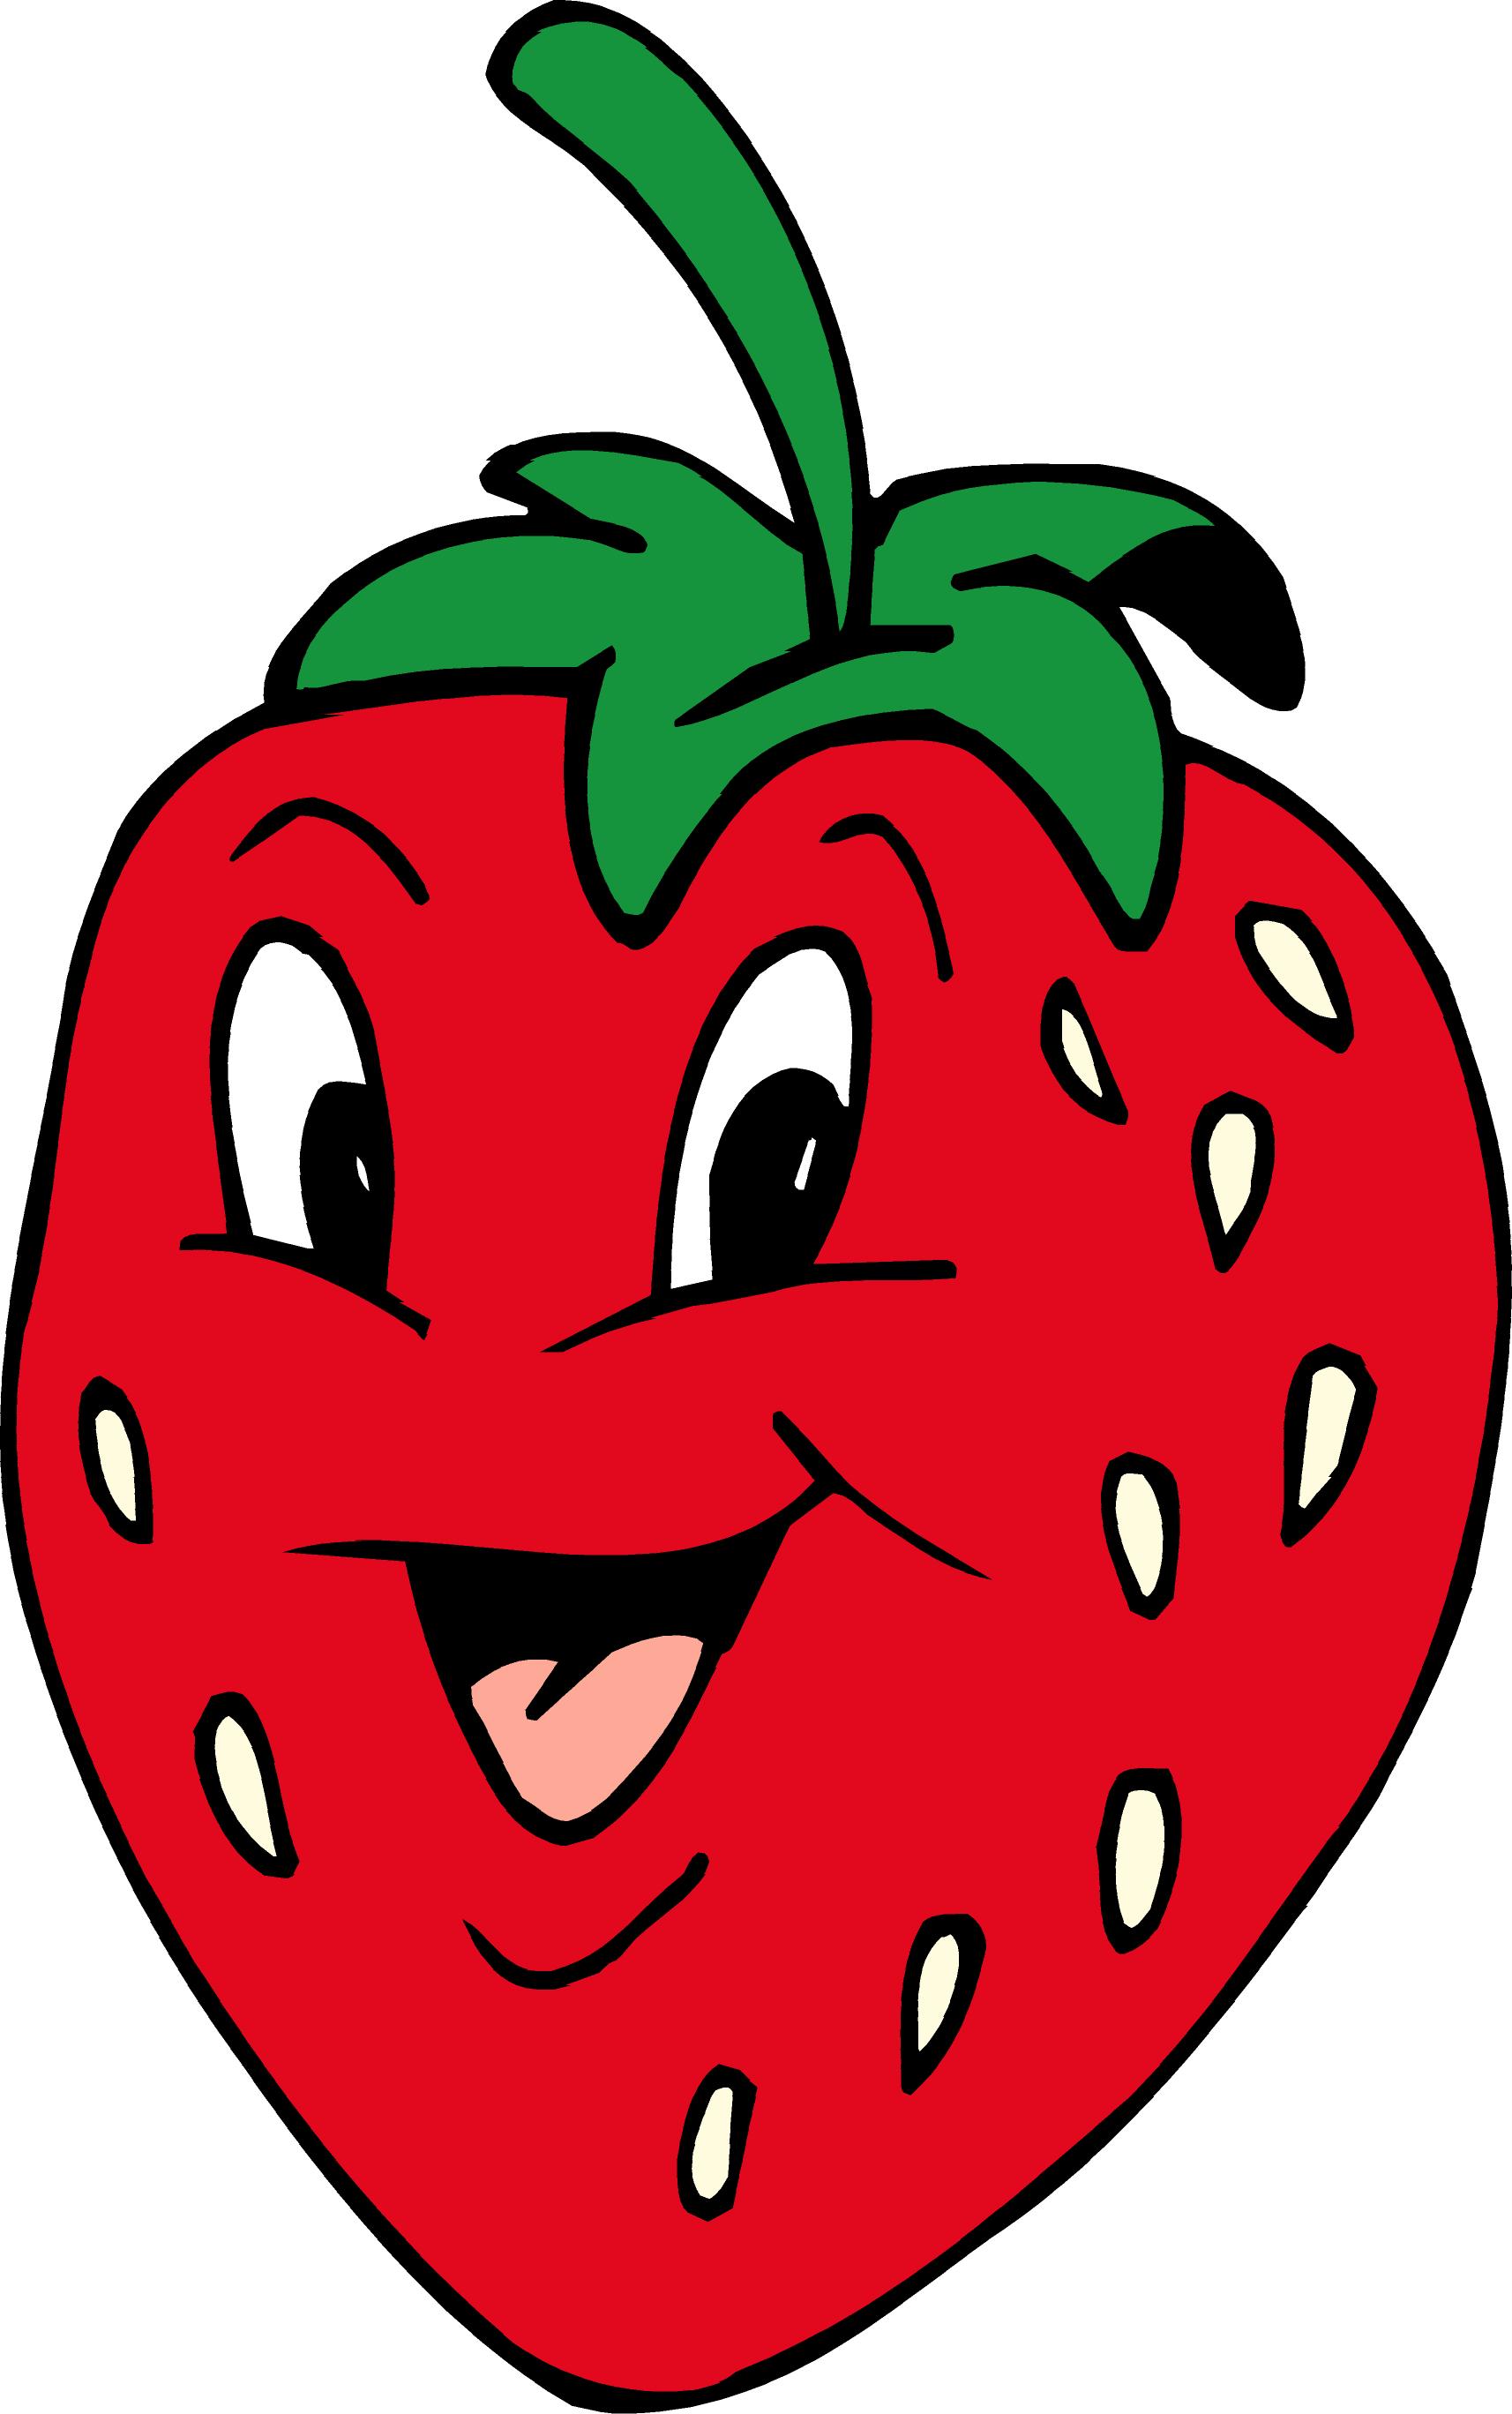 Strawberry clipart Strawberry Clipart Clipart Images Free